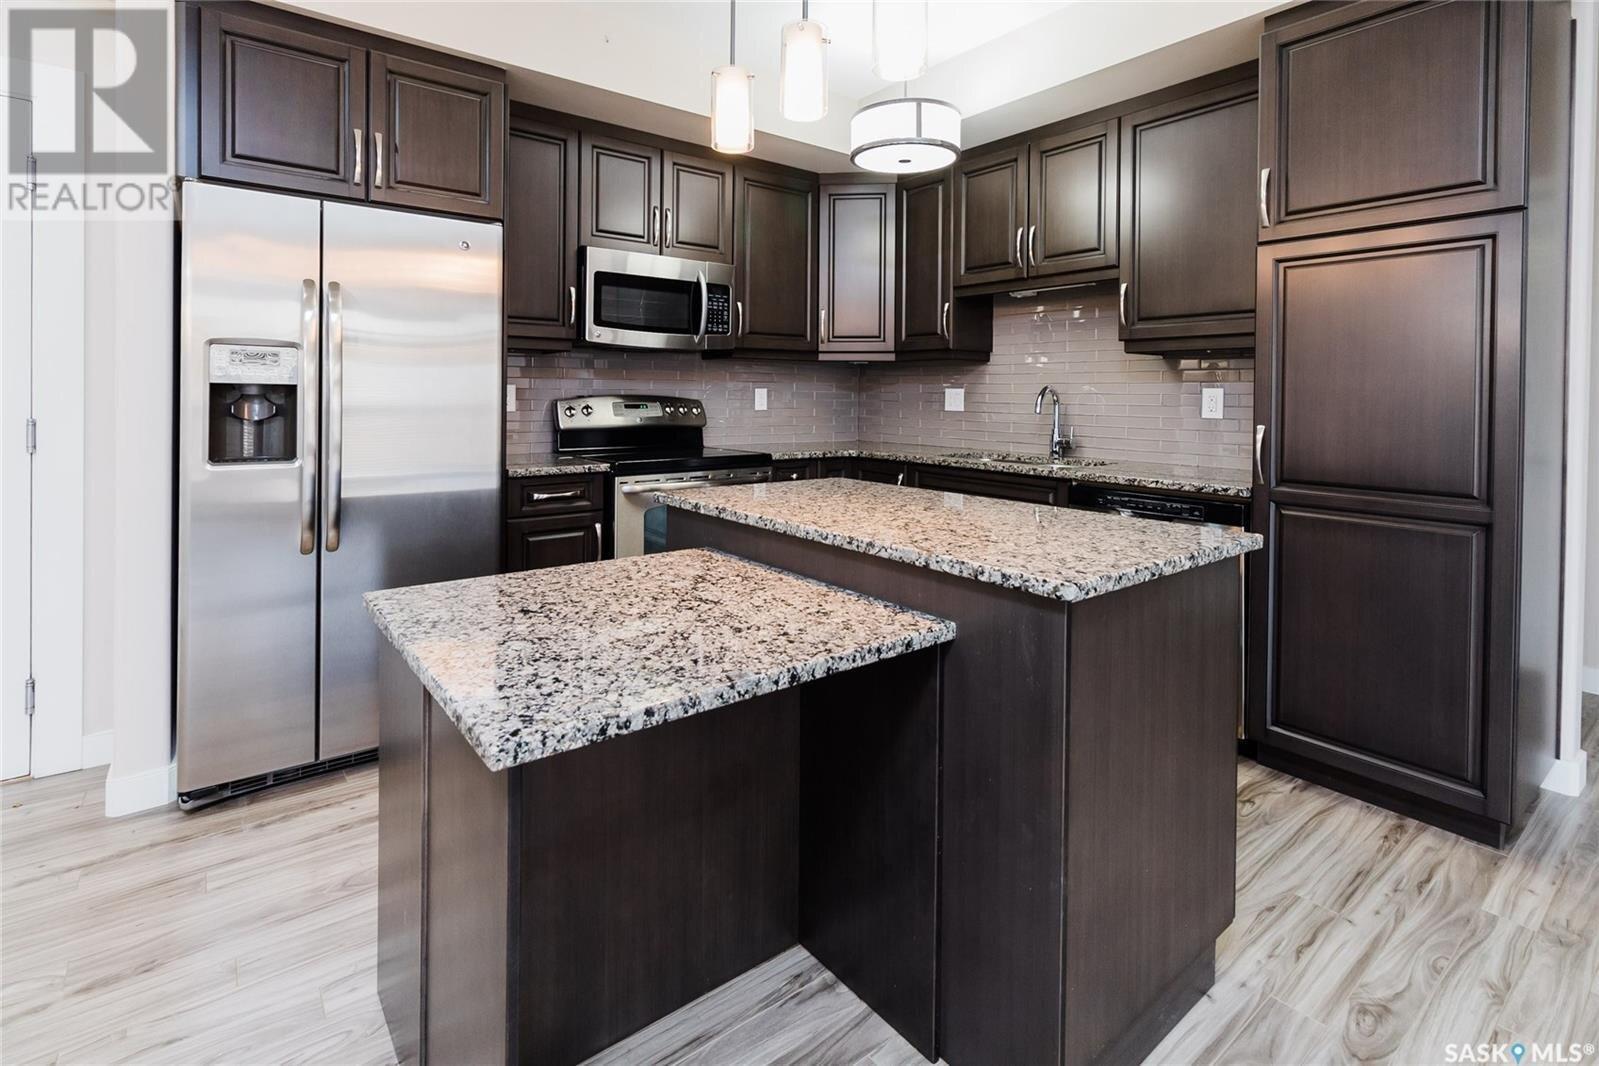 Condo for sale at 1035 Moss Ave Unit 215 Saskatoon Saskatchewan - MLS: SK831677